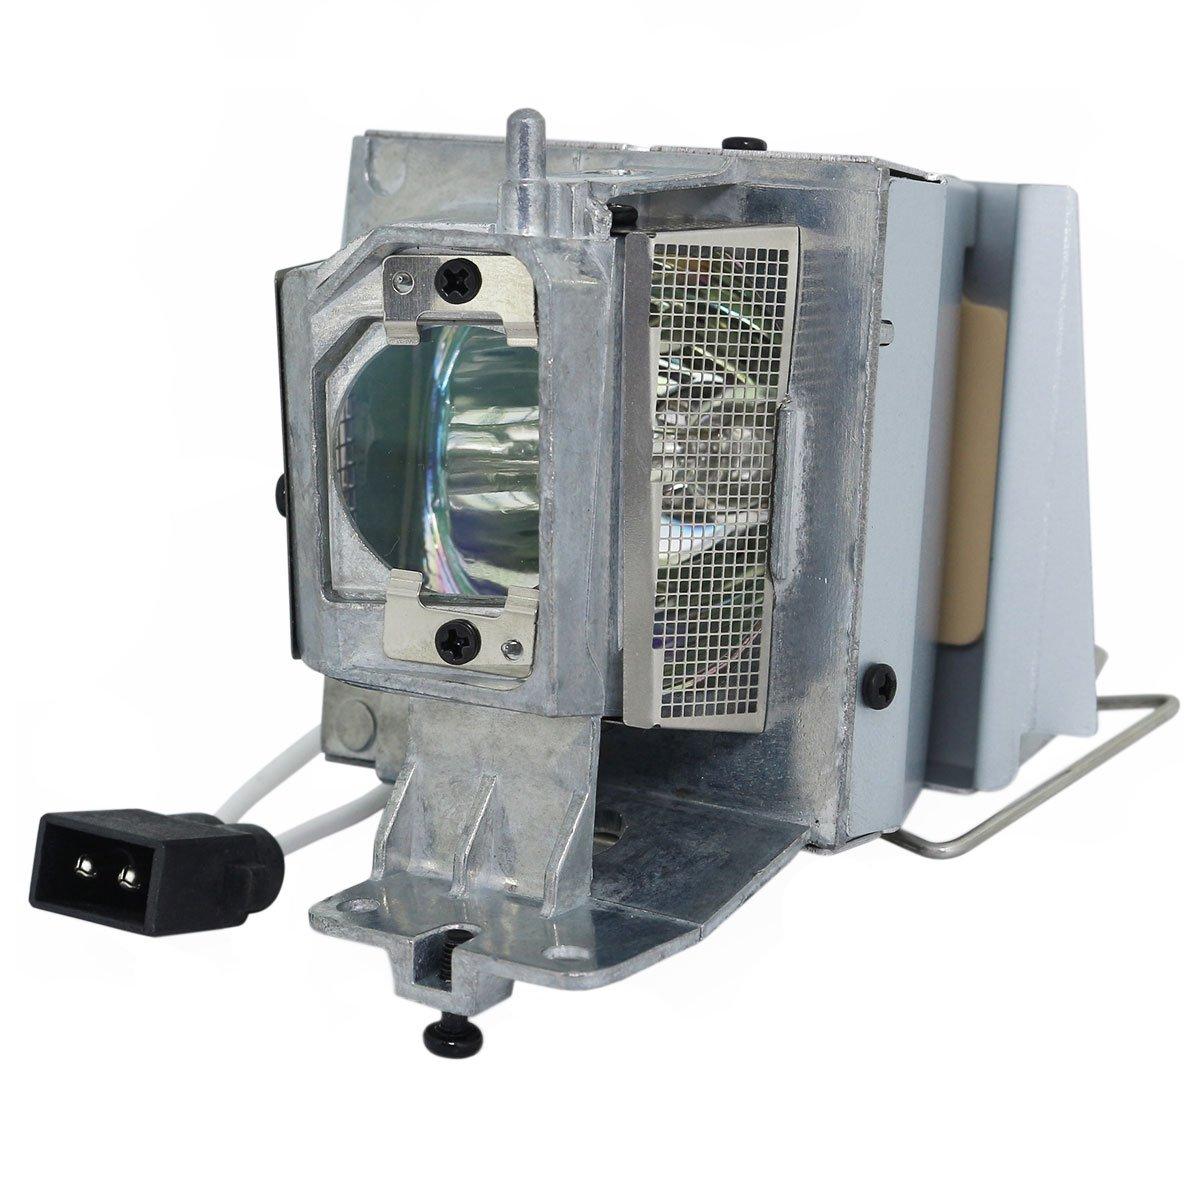 Ceybo EH416 ランプ/バルブ交換用 ハウジング付き Optoma プロジェクター用 B07PDB2695